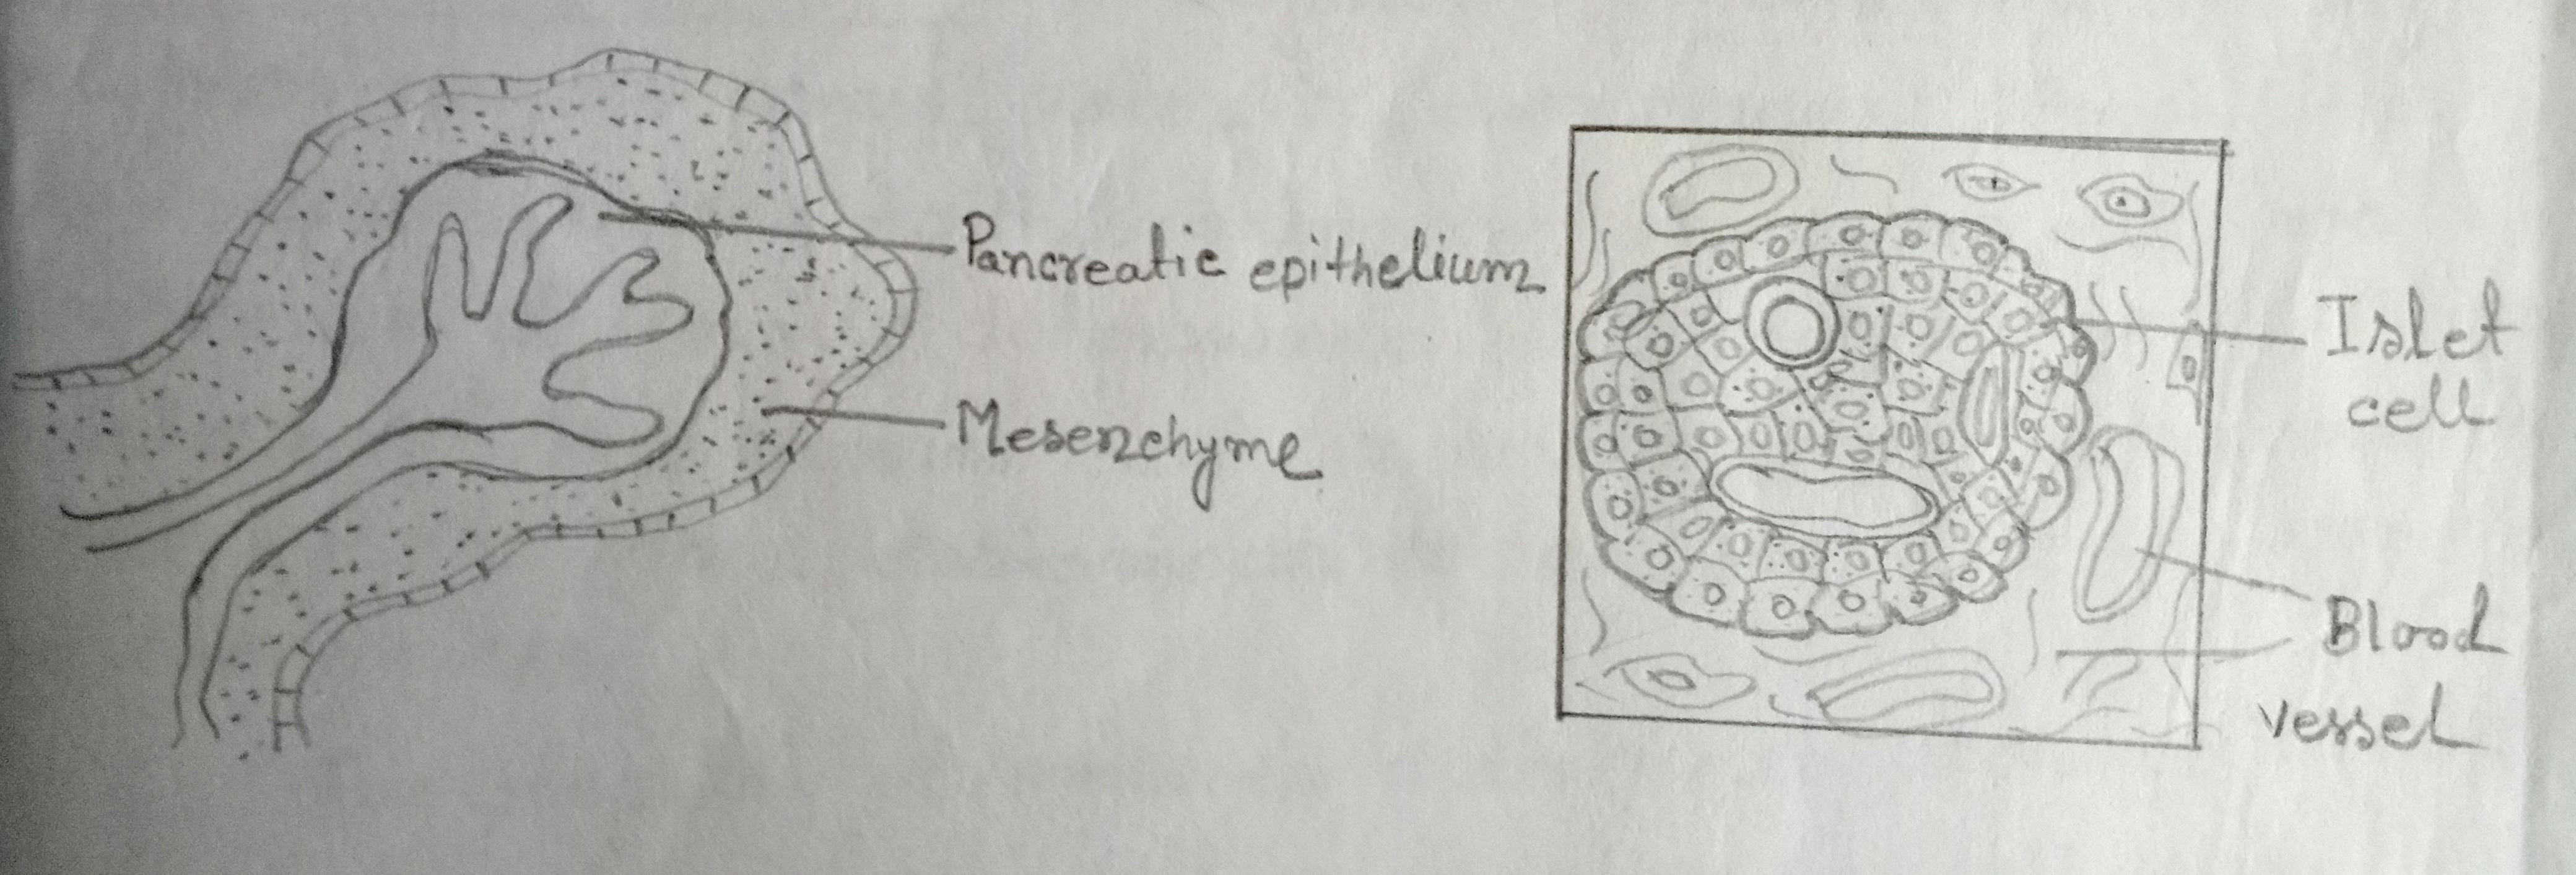 Development of pancreas in a mammal